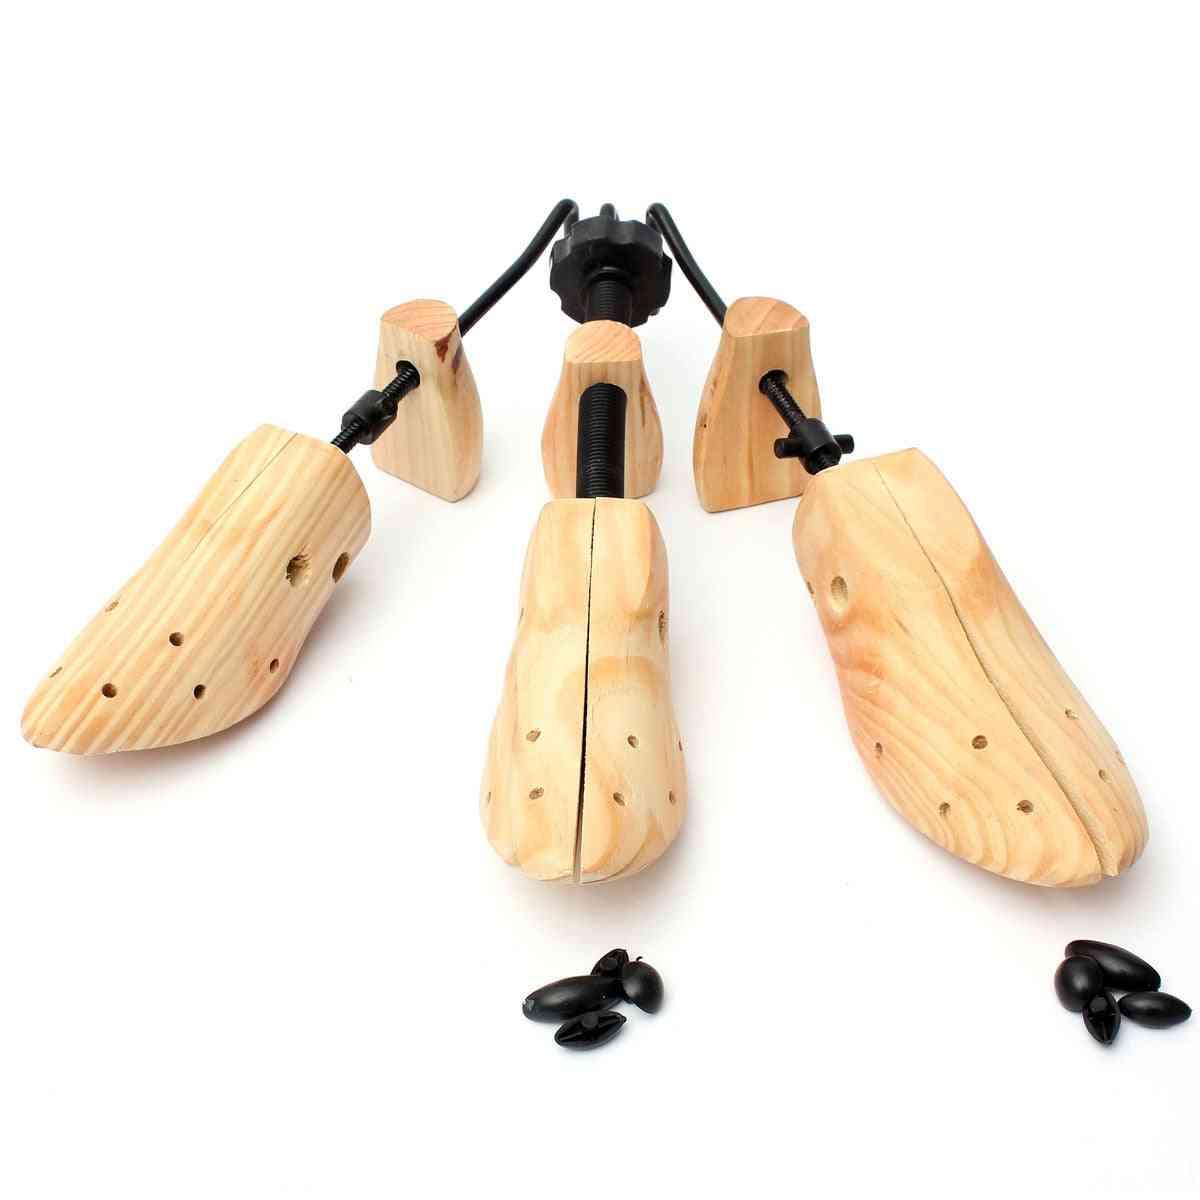 Durable Shoe Tree Wood Stretcher, Wooden Adjustable Man Women Flats Pumps Boot Shaper Rack Expander